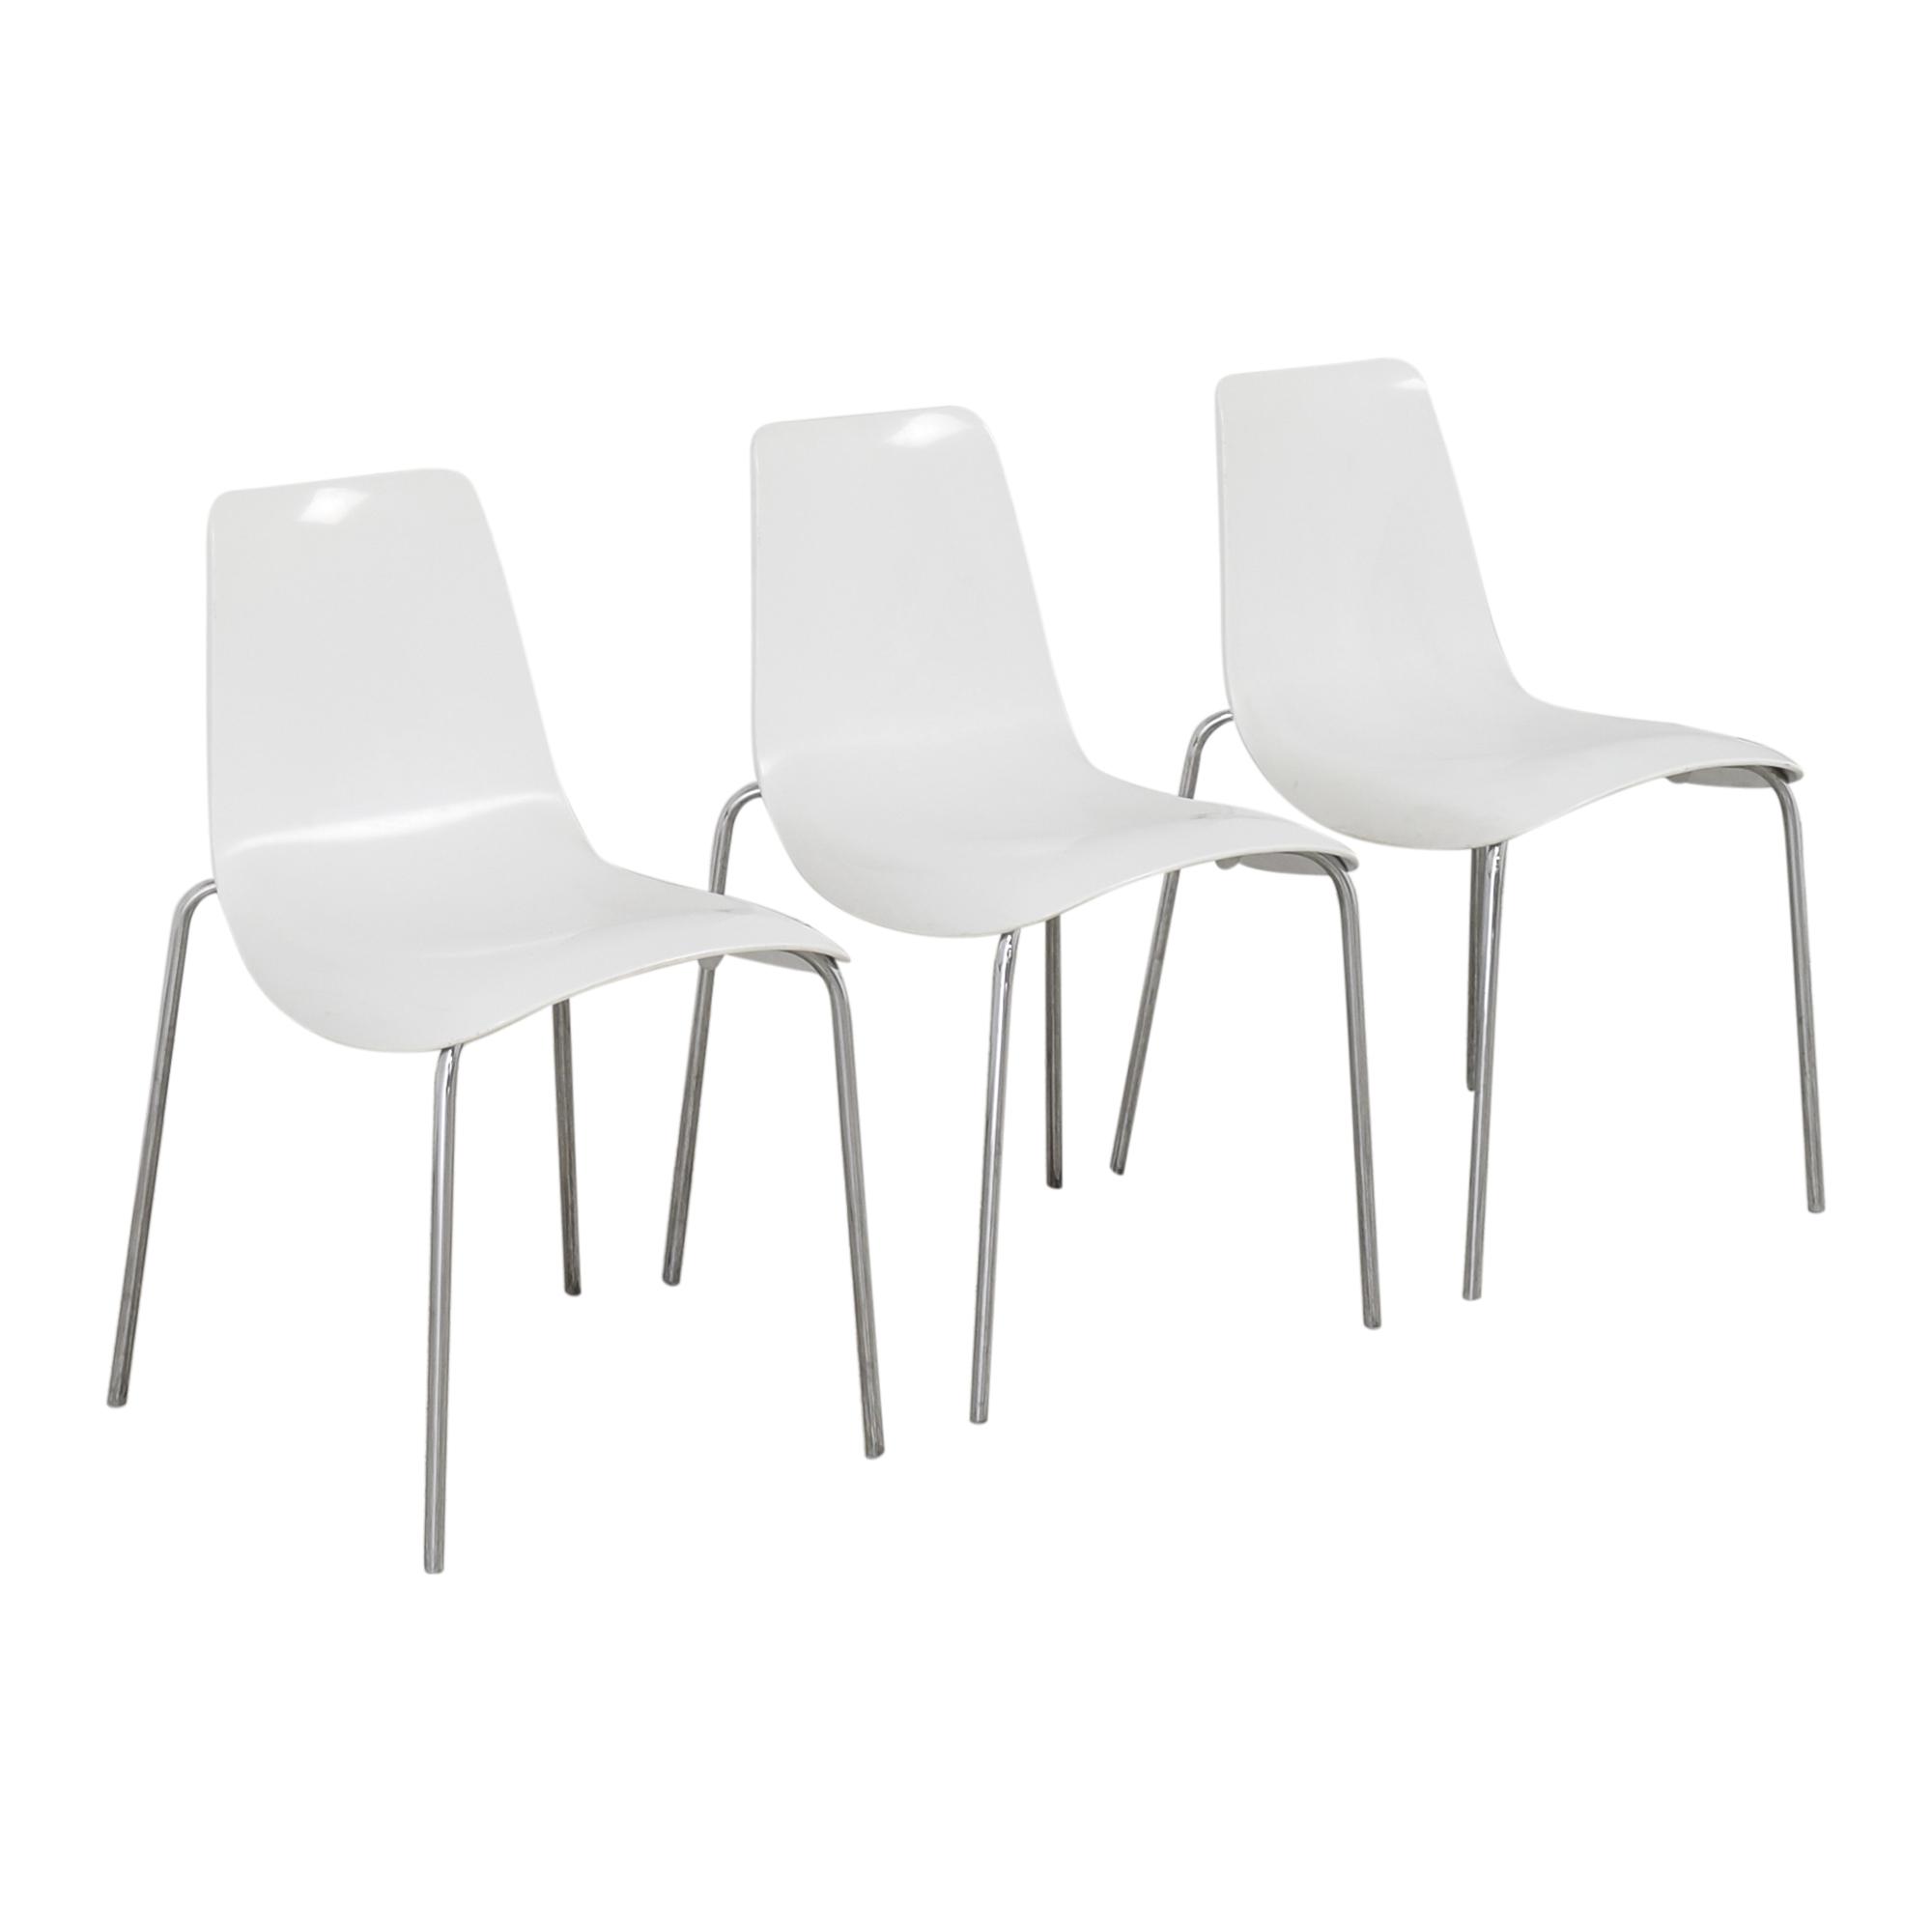 Bonaldo Bonaldo Lei Stackable Chairs nj